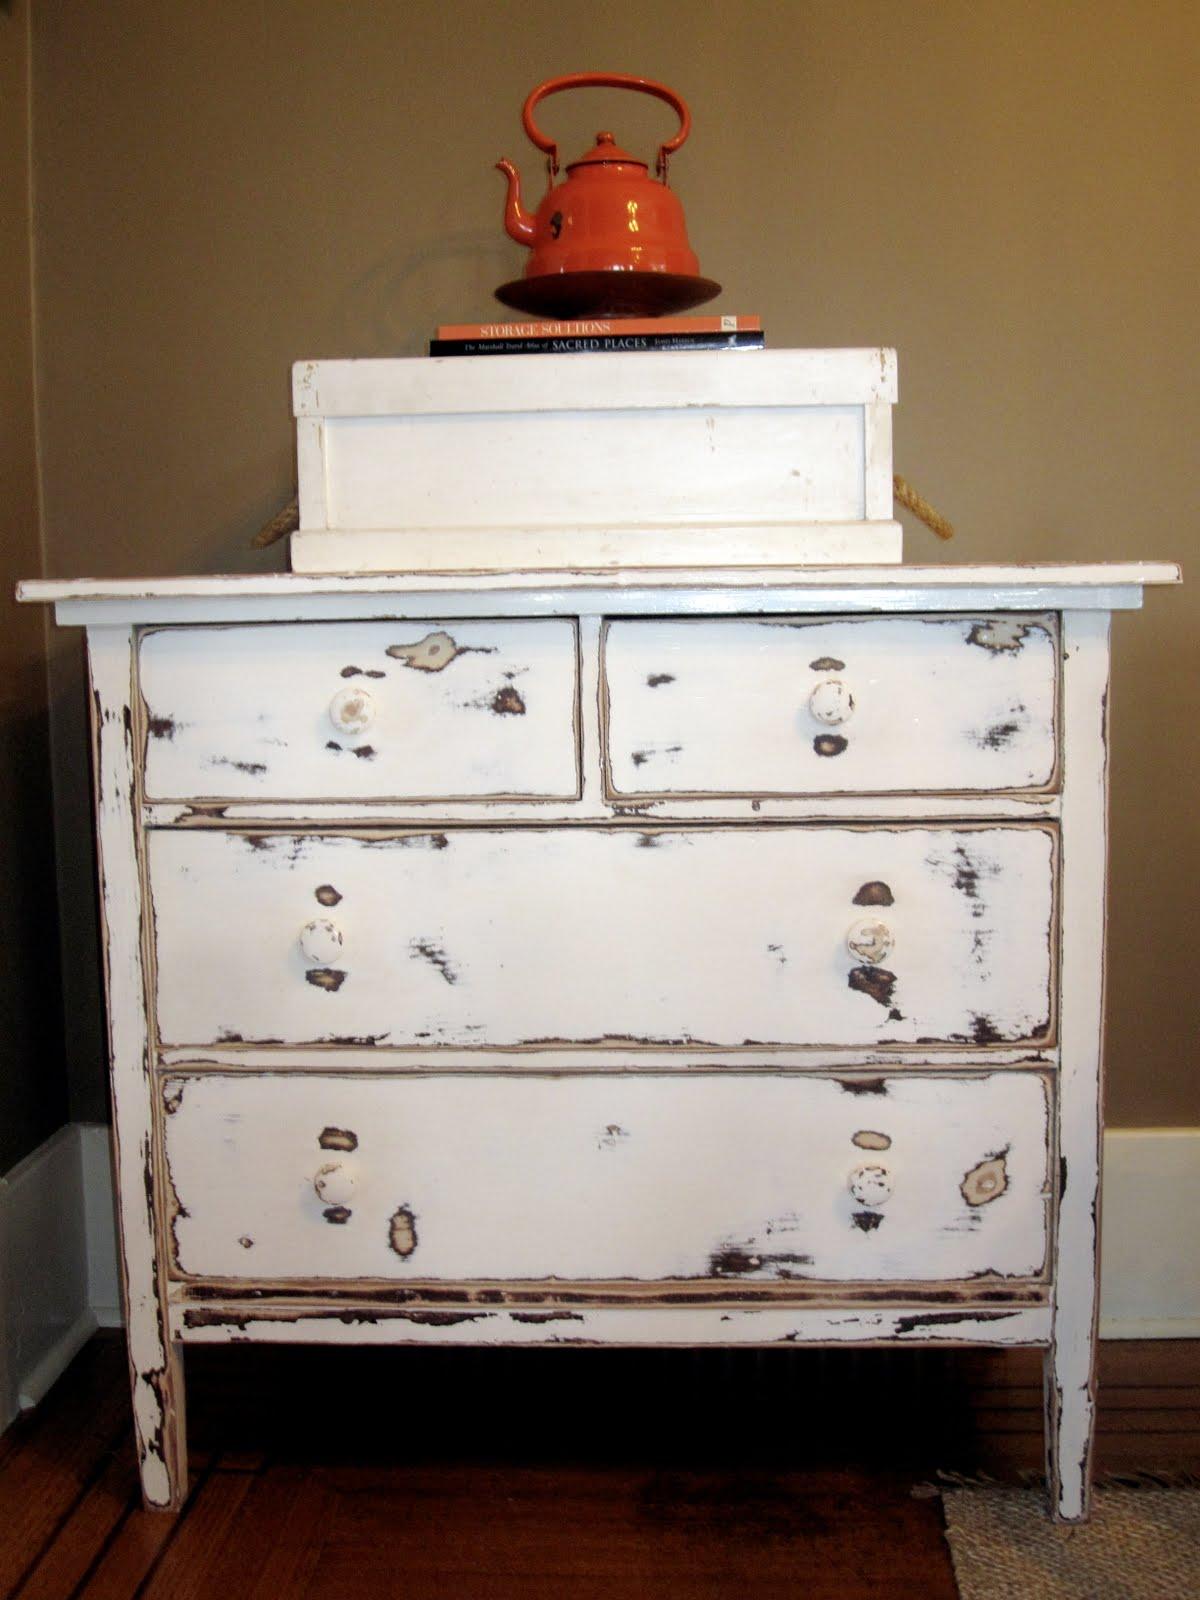 Sweet Tree Furniture: Rustic Farmhouse Lowboy Dresser